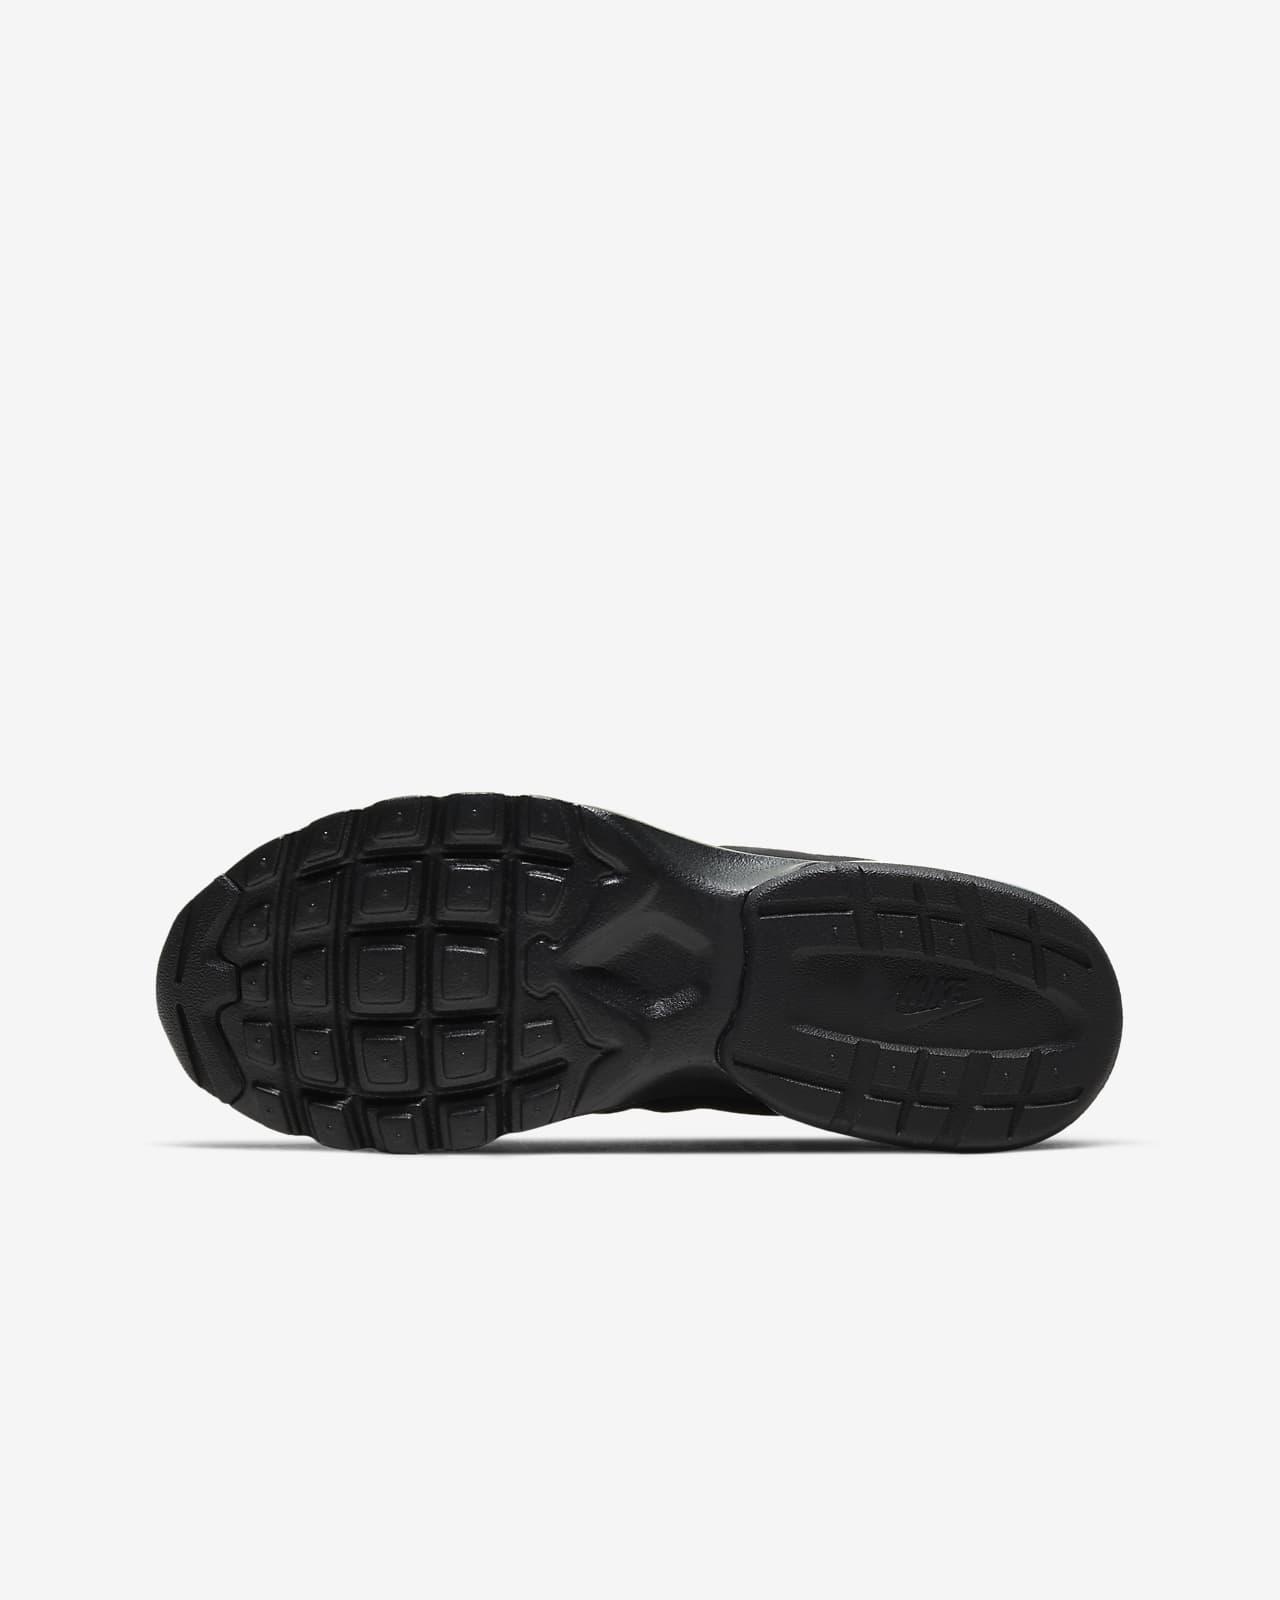 Nike Air Max Invigor Older Kids' Shoes. Nike LU